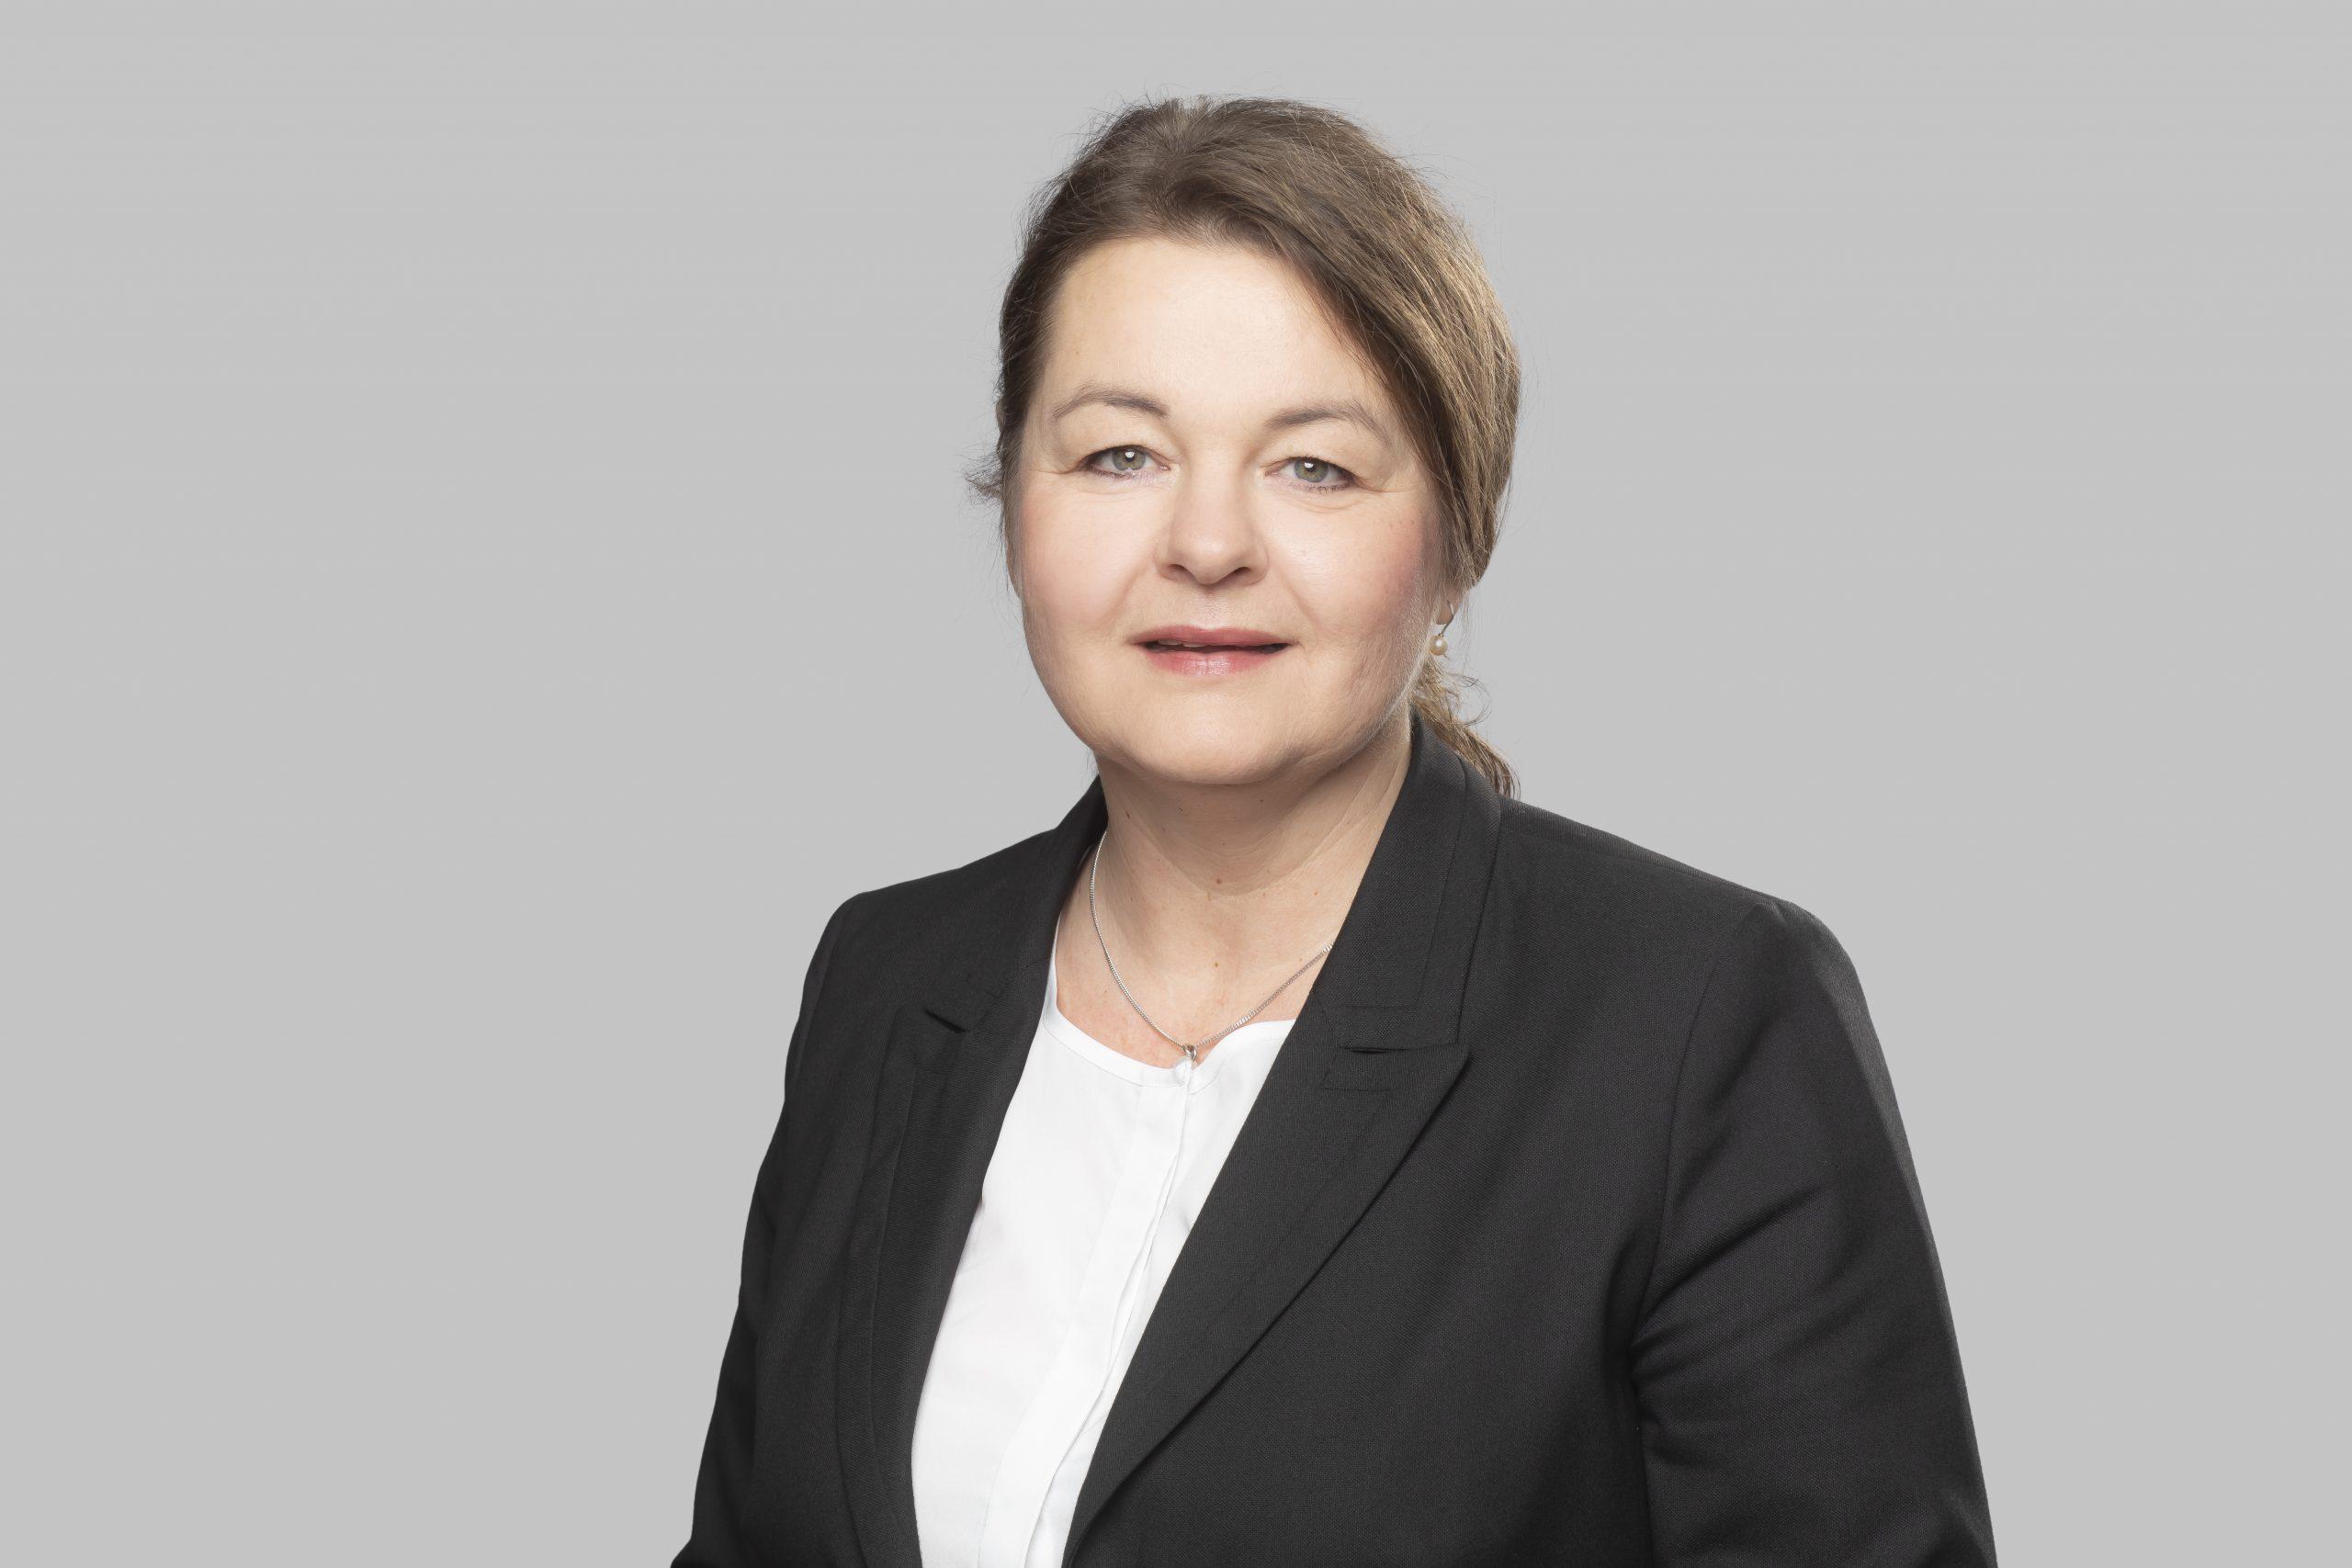 Angelika Wientzek